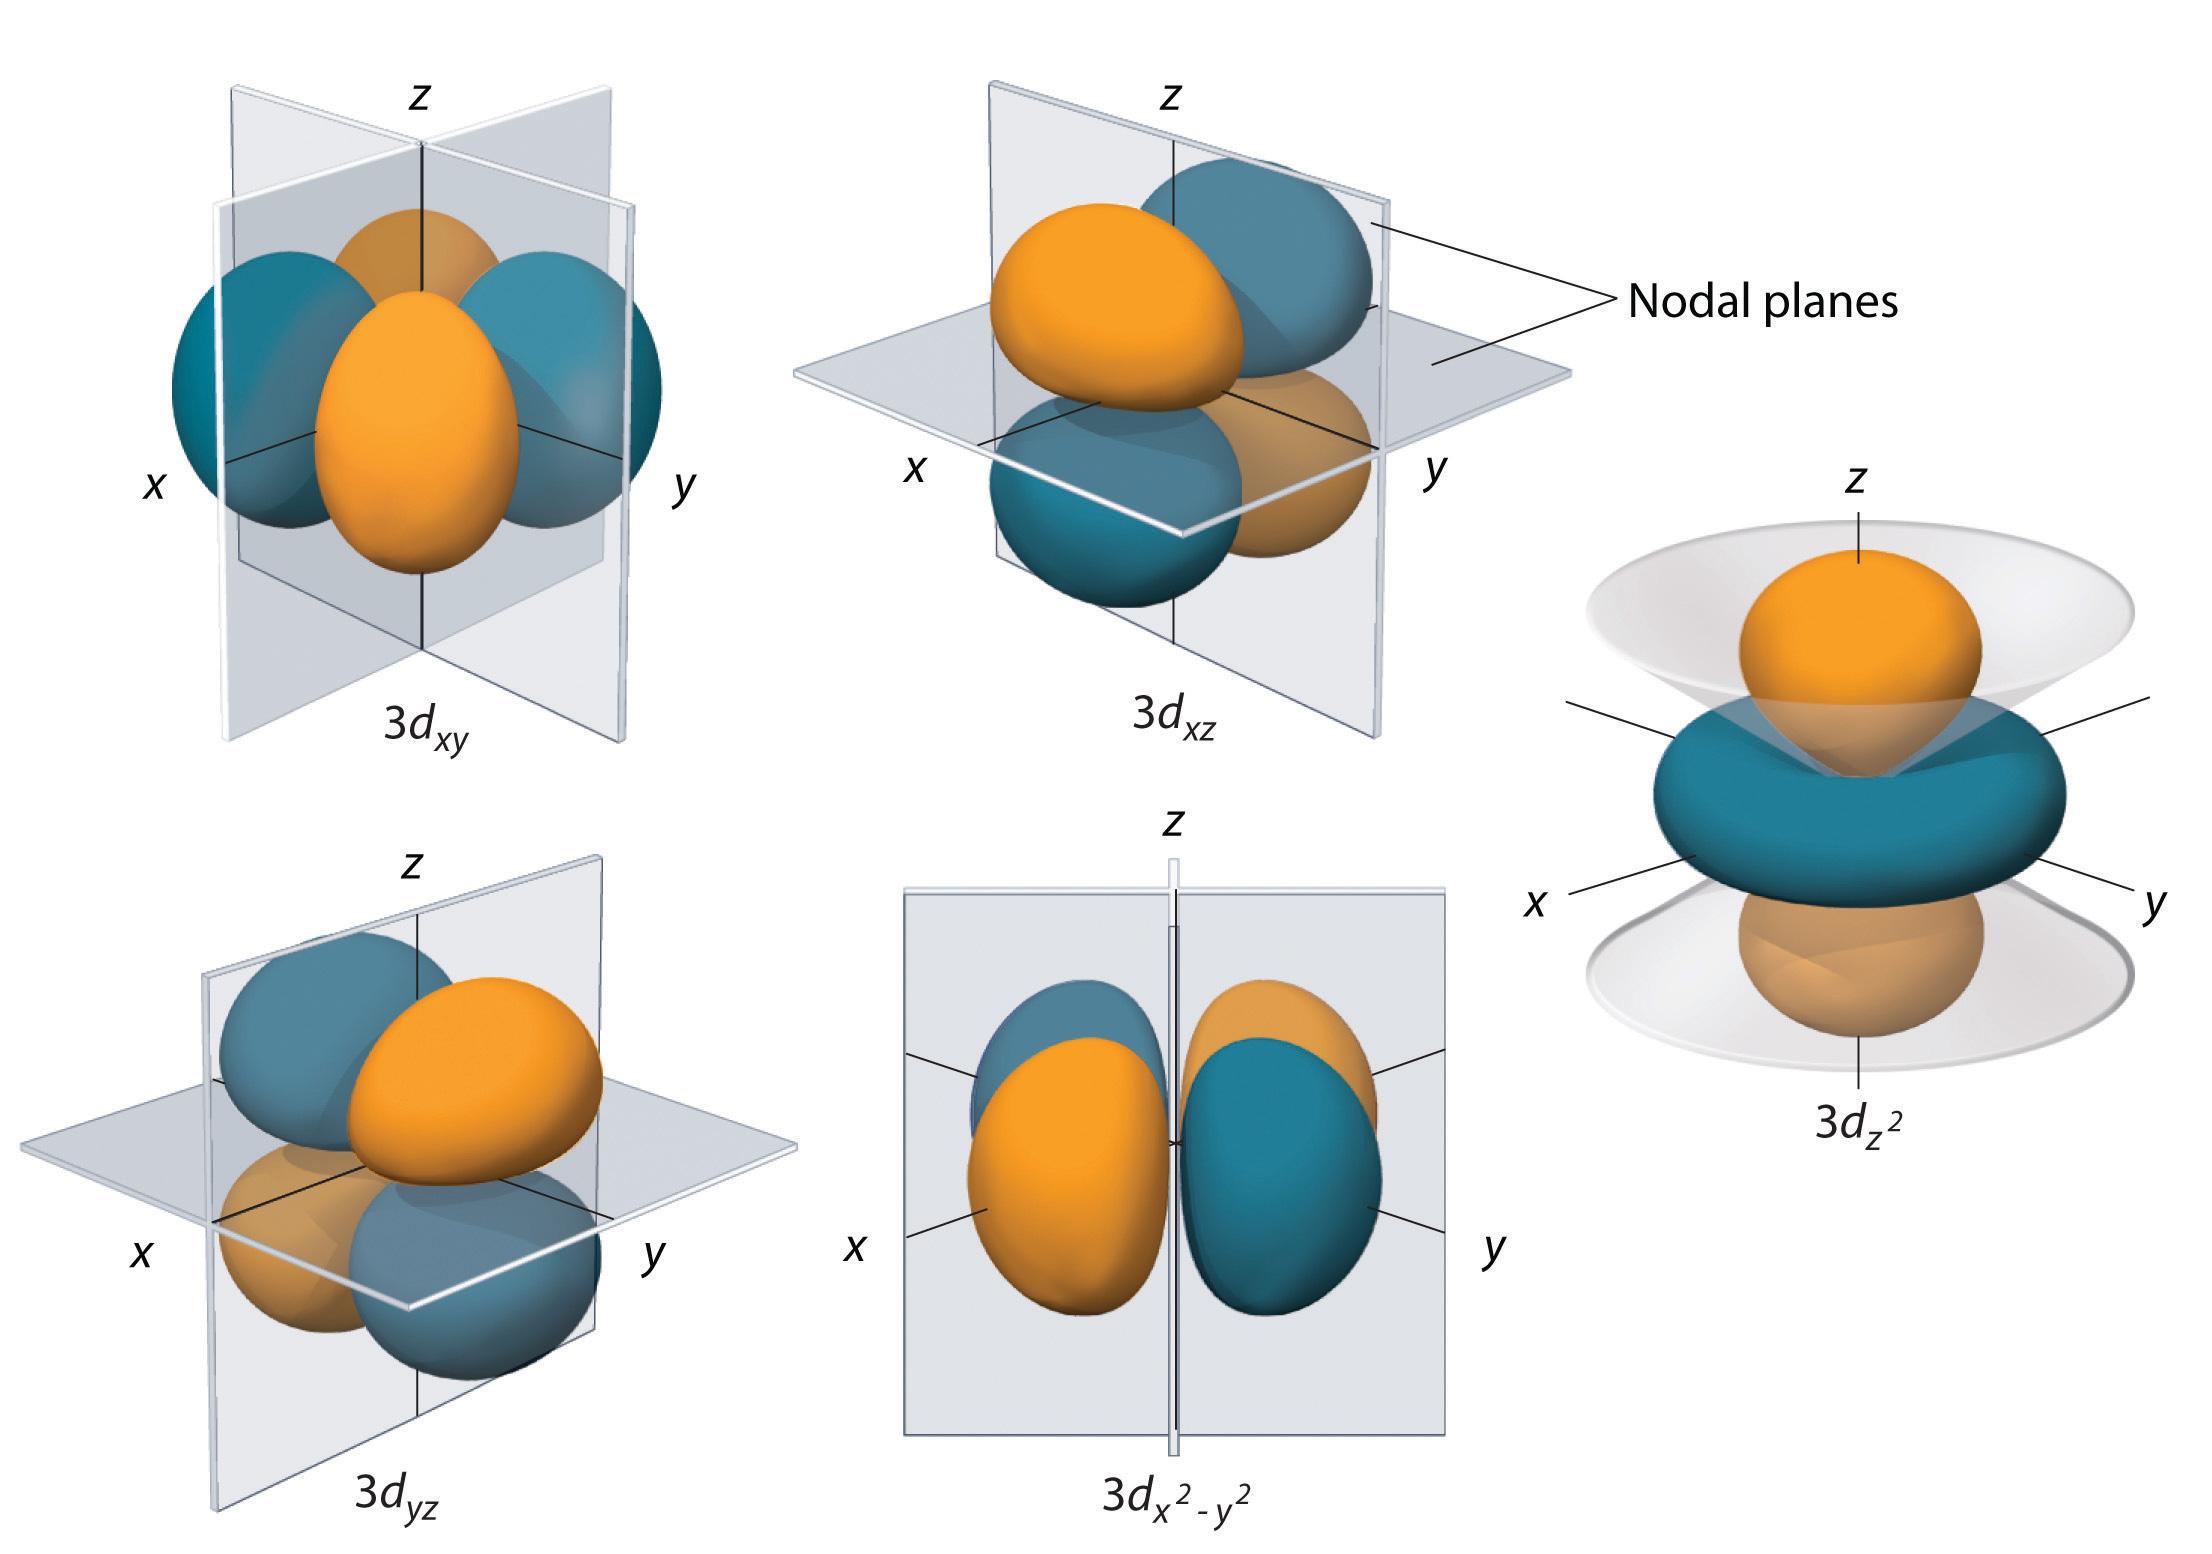 http://chemwiki.ucdavis.edu/Wikitexts/Howard_University/General_Chemistry%3A_An_Atoms_First_Approach